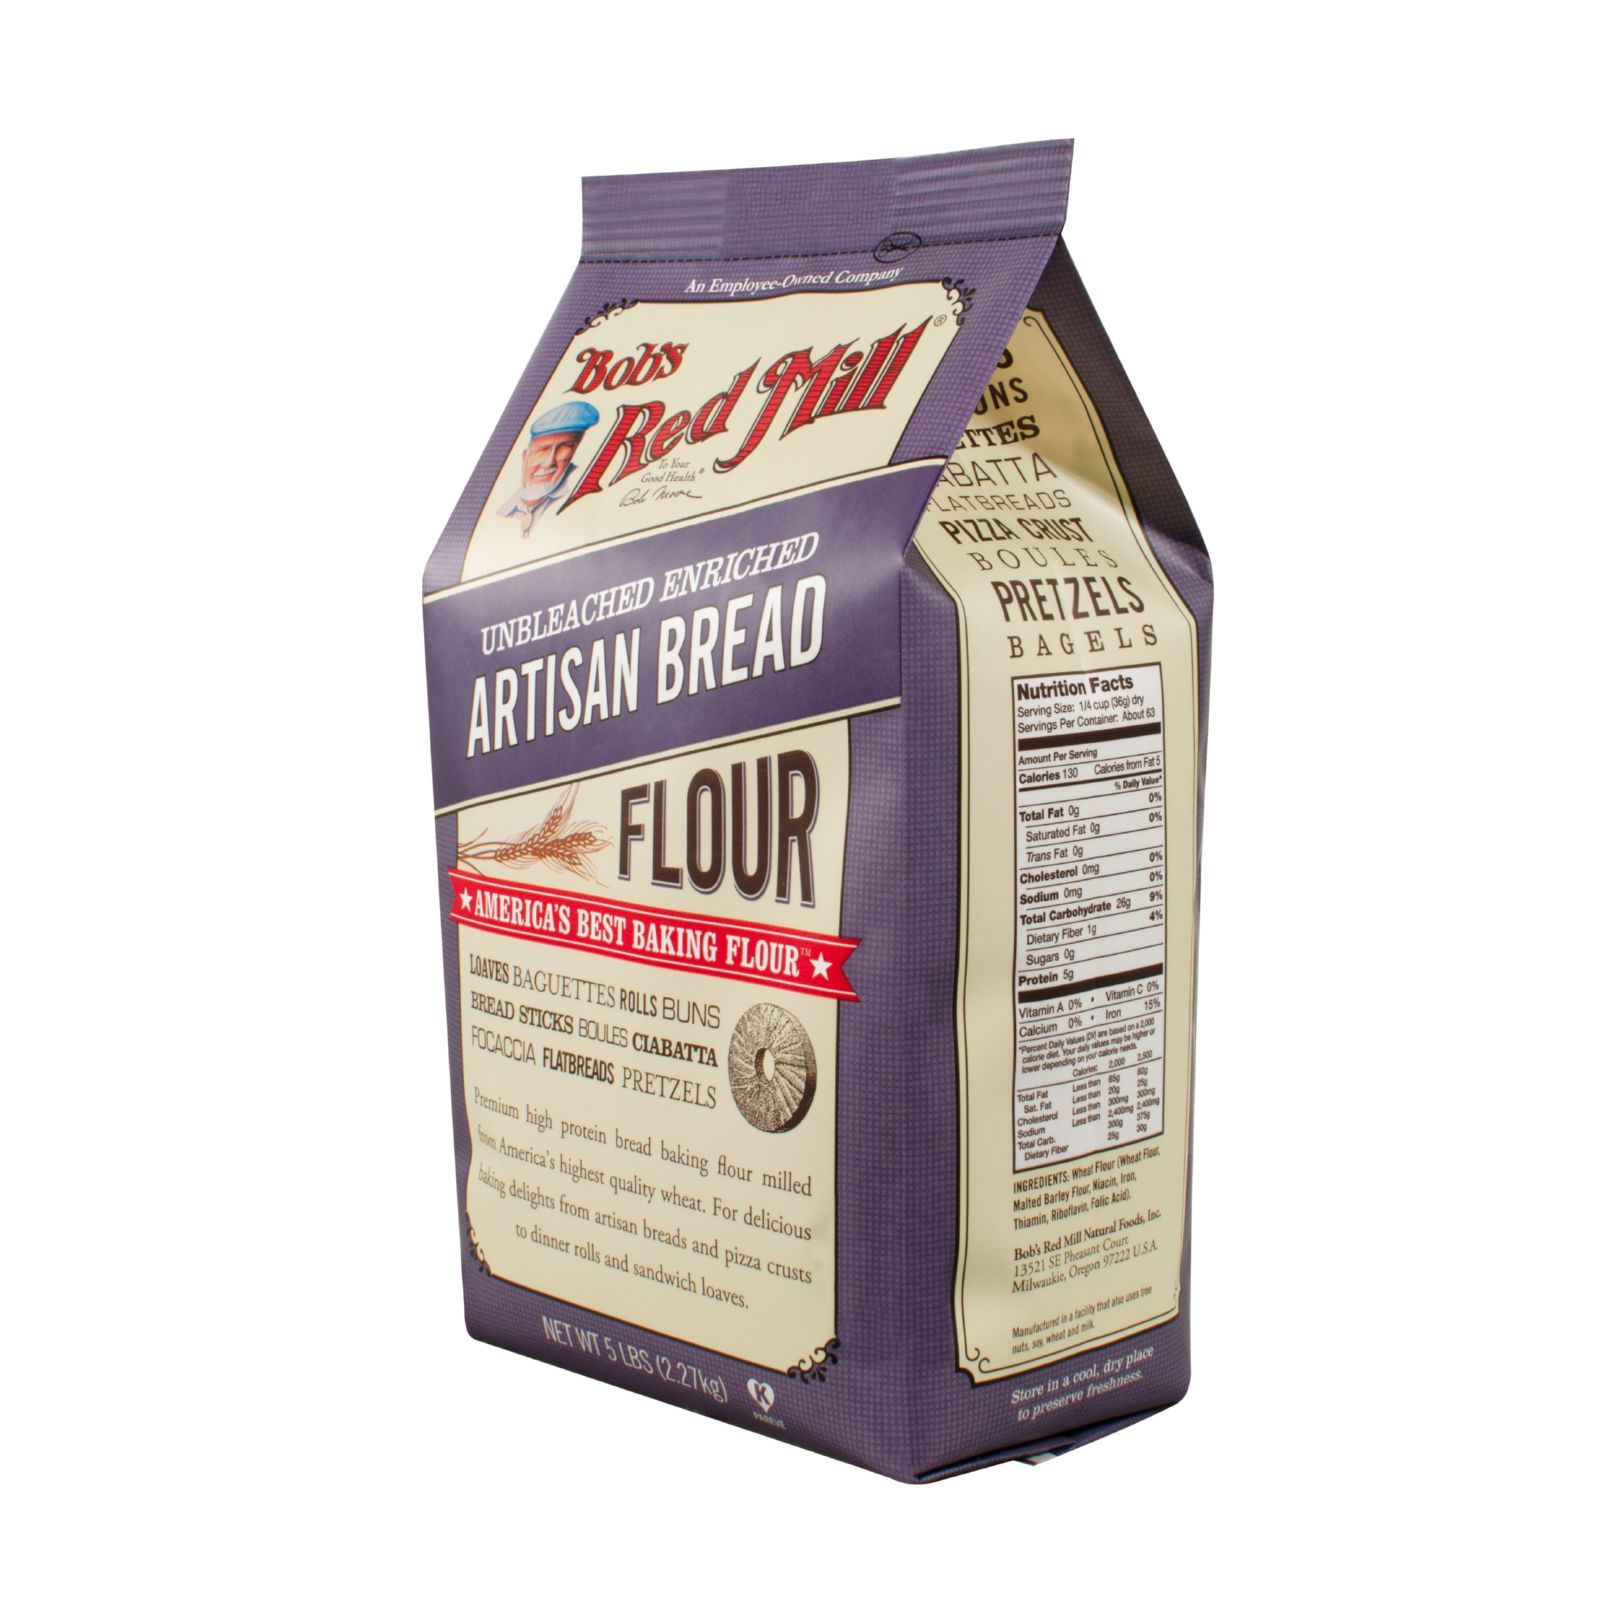 Bob's Red Mill Artisan Bread Flour - 5 lb - Case of 4